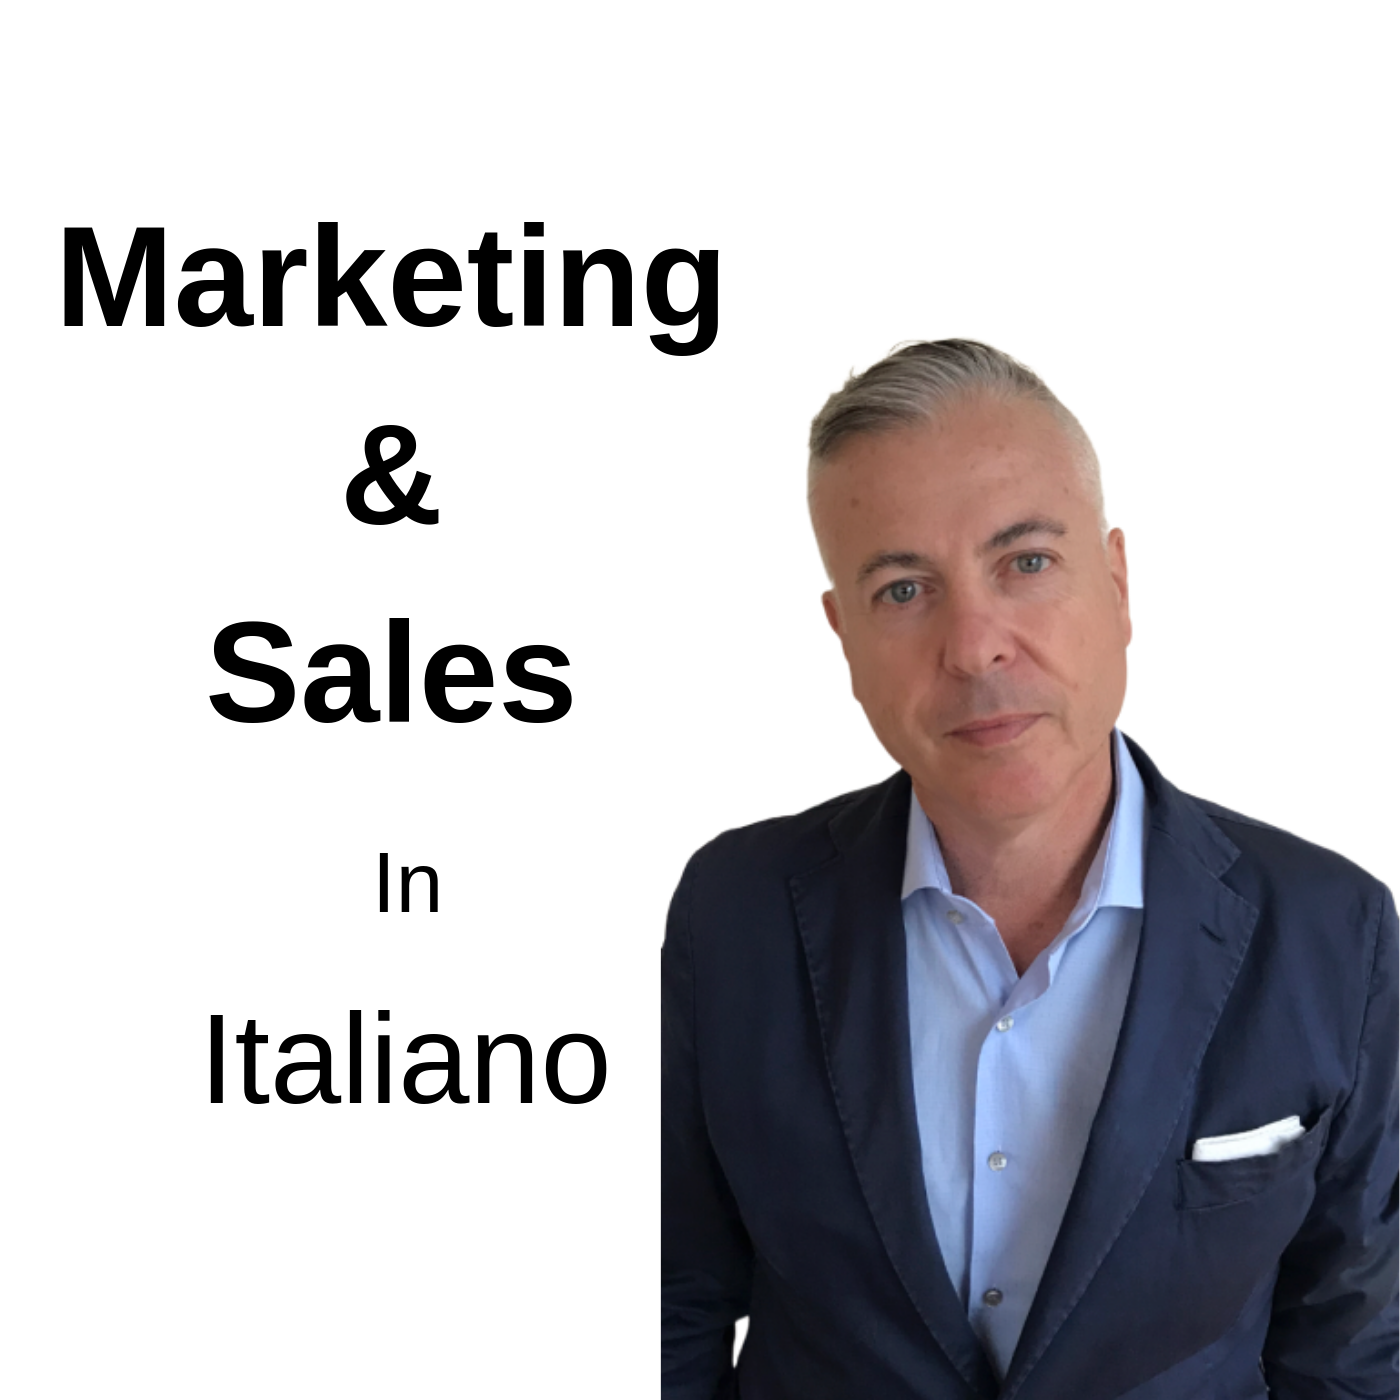 Marketing and Sales in Italiano con Robert Julian Smith show art